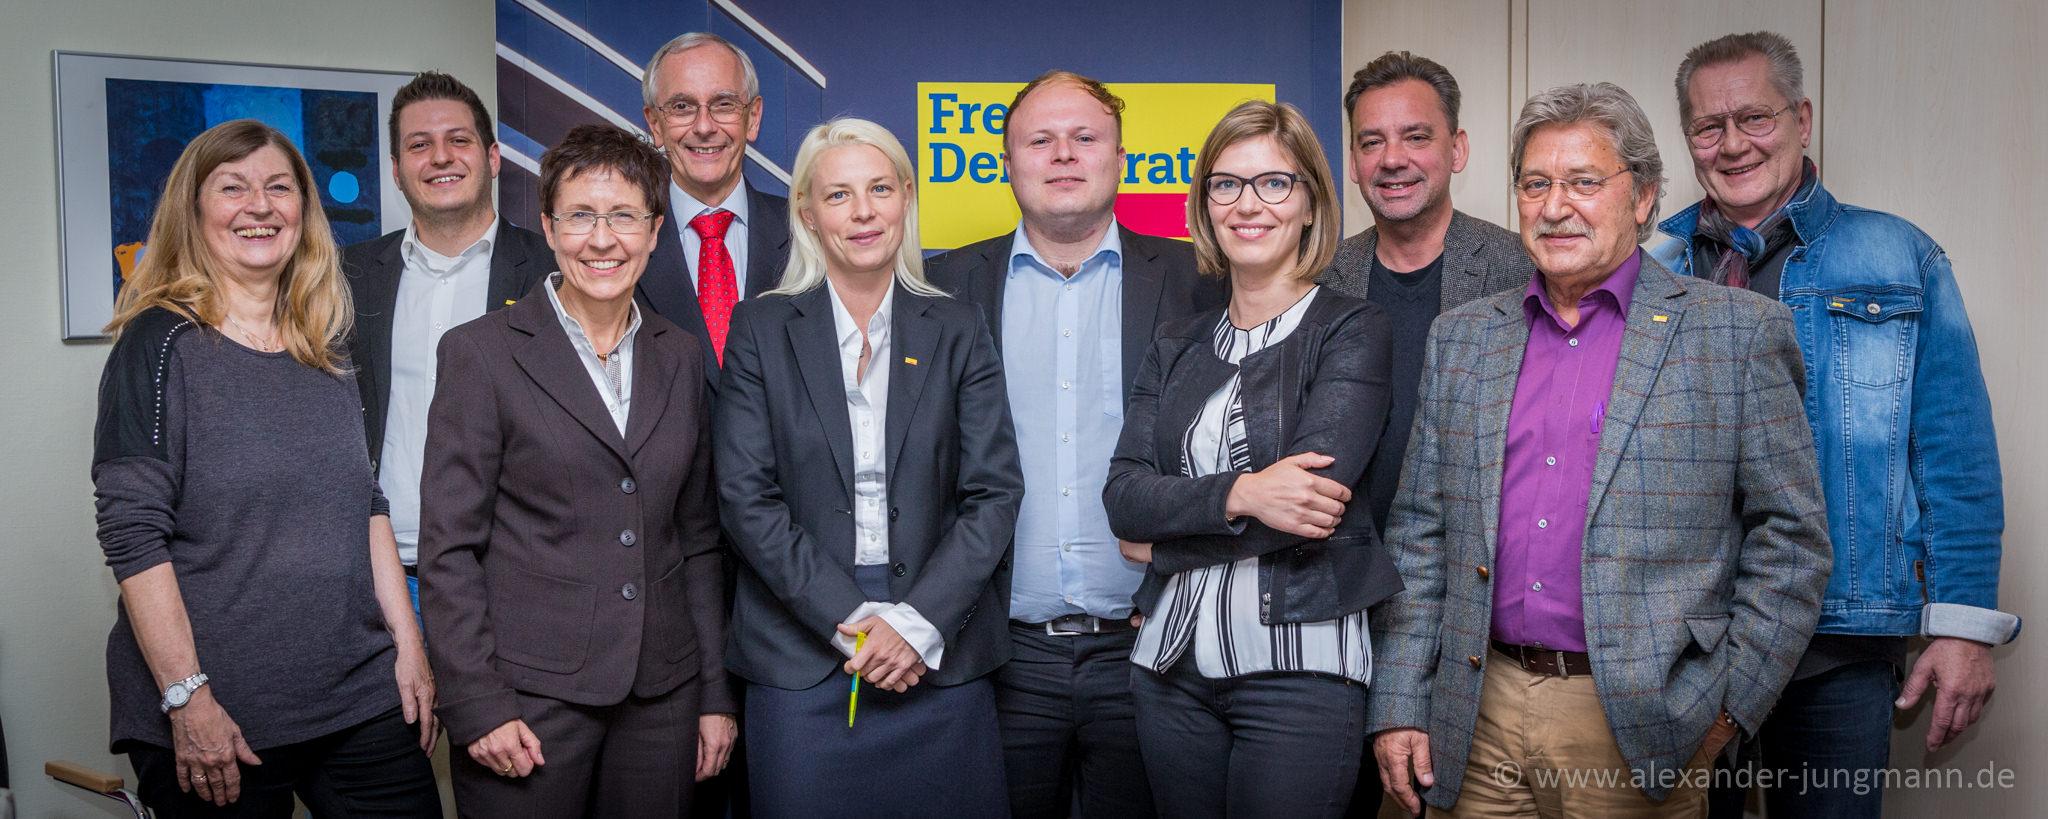 vlnr: Helga Gräber, Simon Gröpler, Dagmar Weiner, Hans-Joachim Neumann, Susann Guber, Dirk Stender, Lisa Schmitz, Andreas Monath, Rolf Scholibo, Jörg Kloppstech